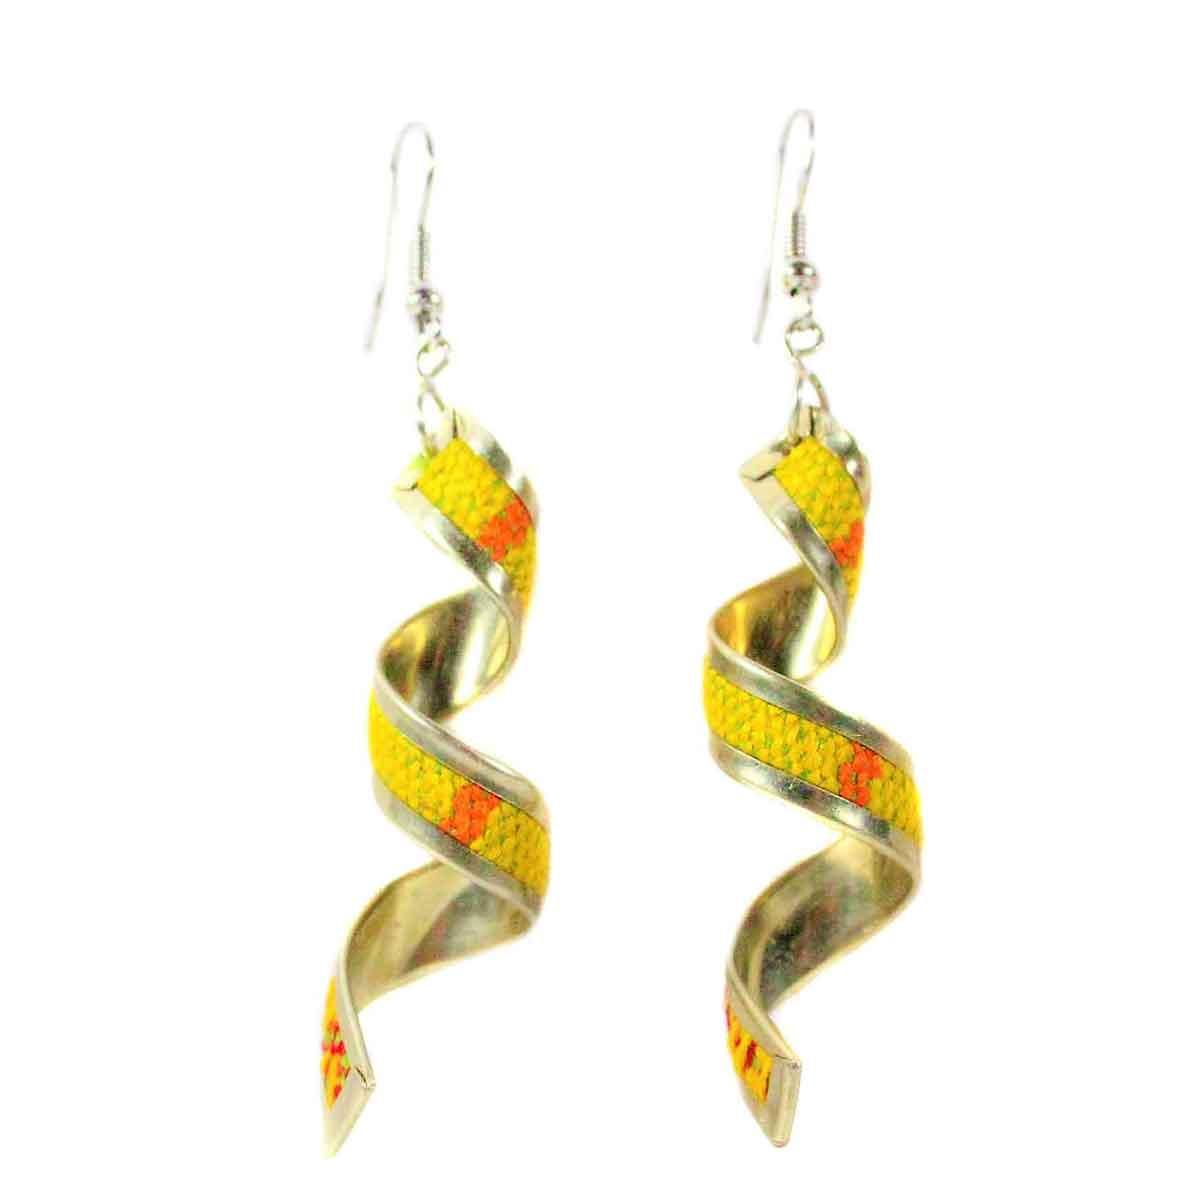 Inka-Products-Boucles d'Oreilles Tissu Traditionnel Péruvien-Spirale Longue Jaune